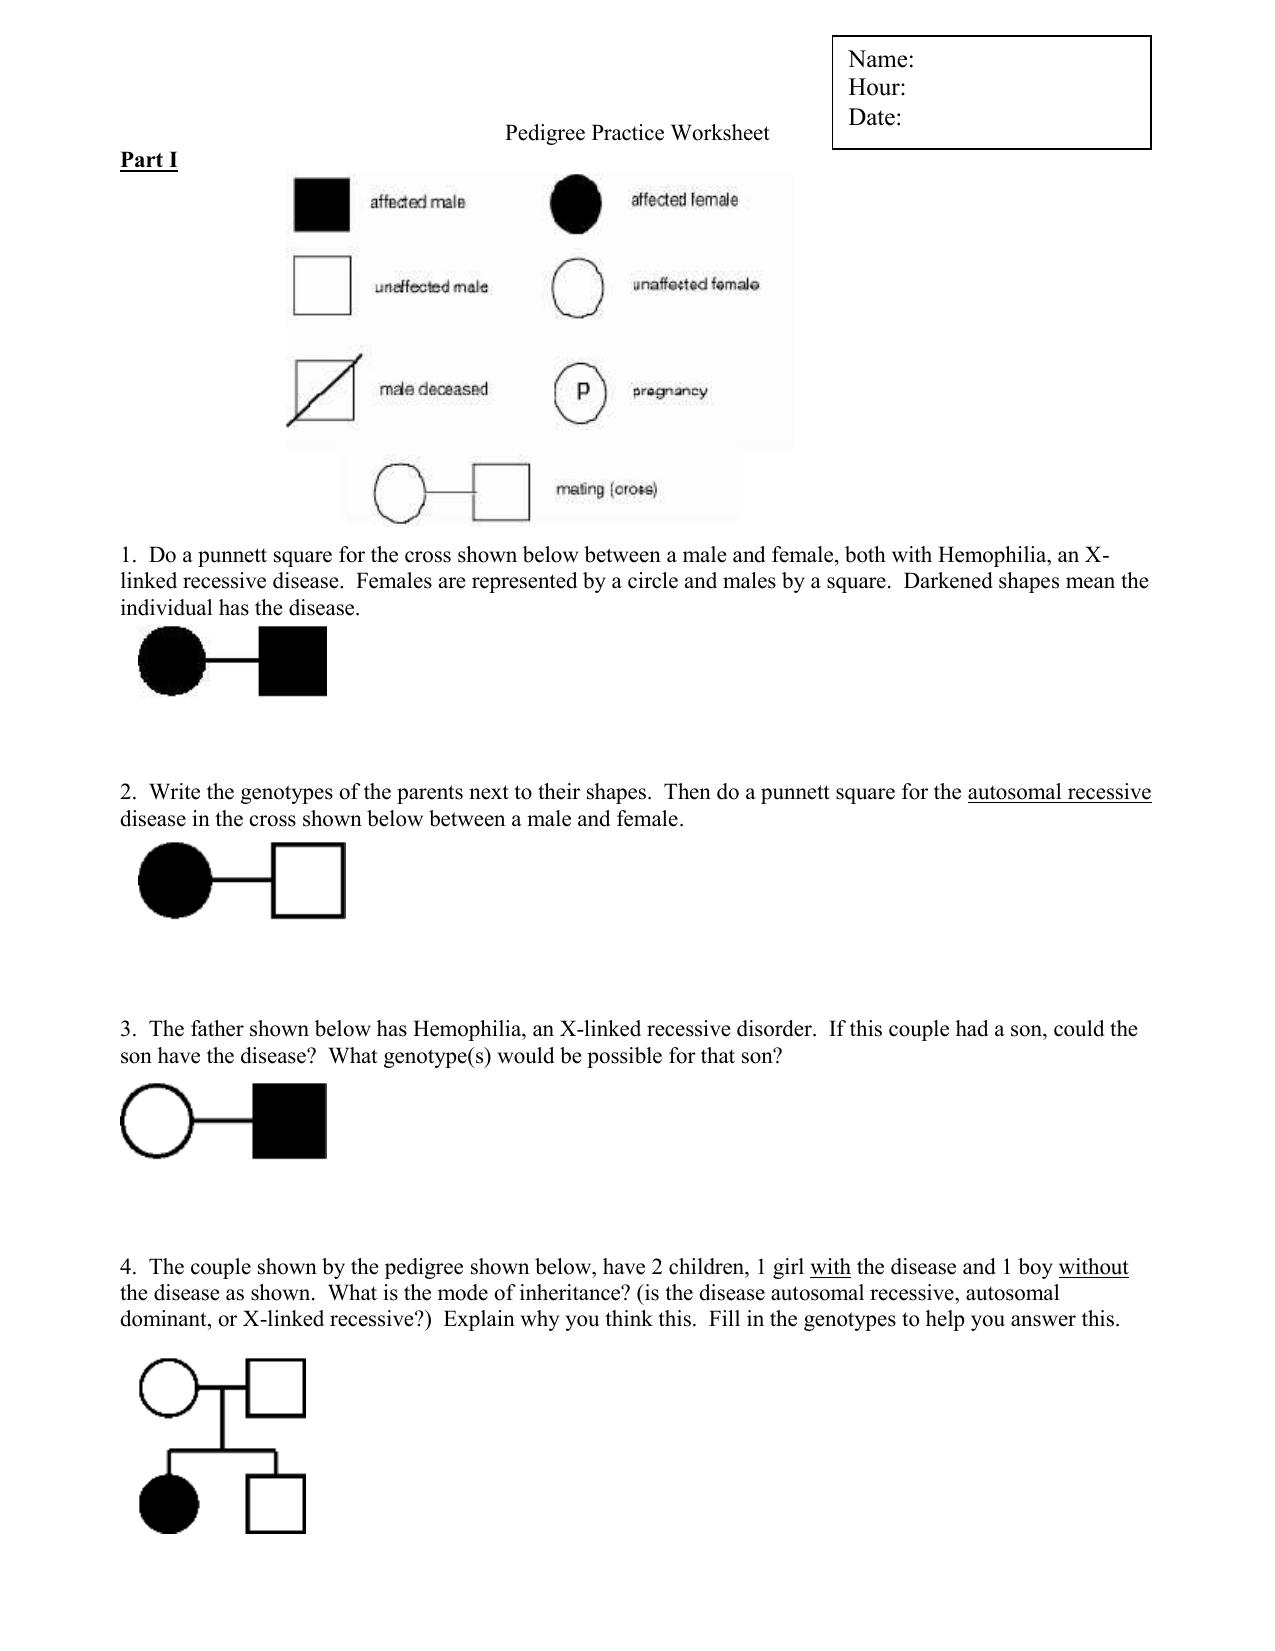 Pedigrees Practice Worksheet Answers